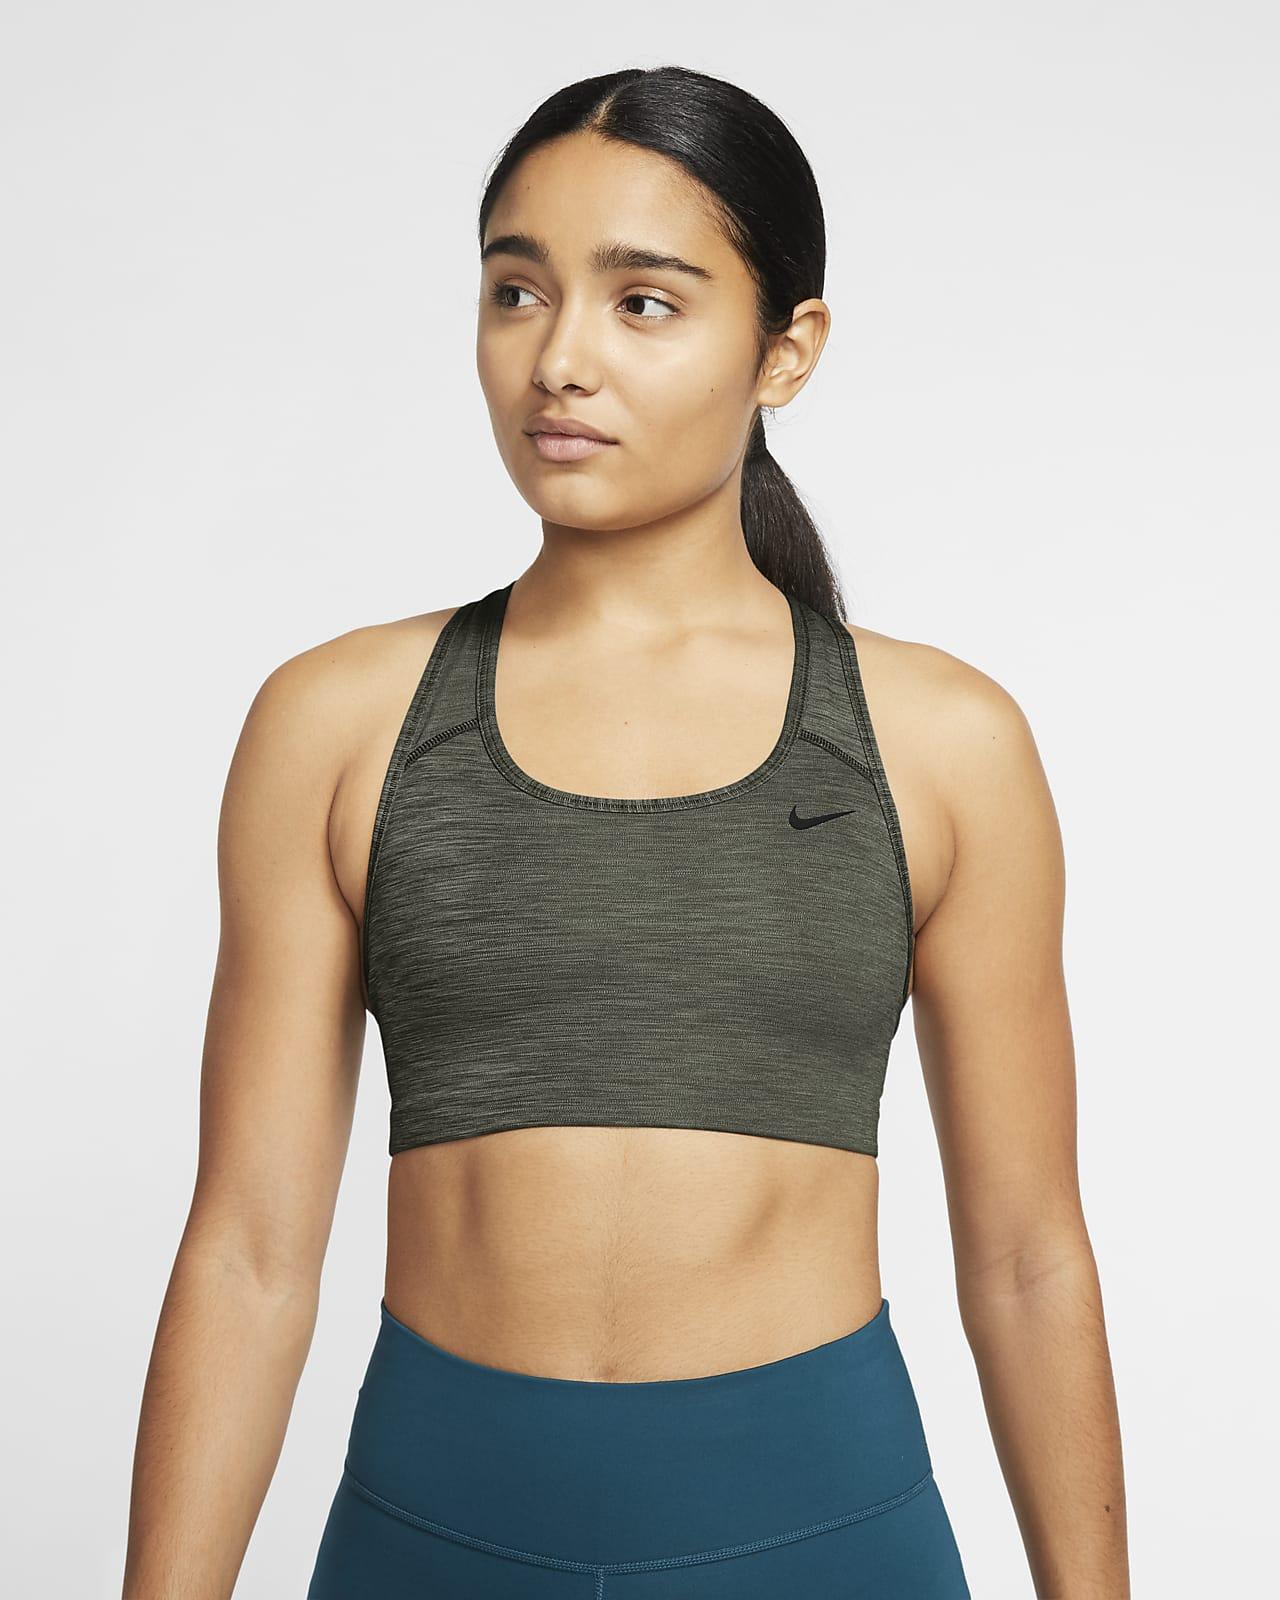 Nike Swoosh Women's Medium-Support Non-Padded Sports Bra